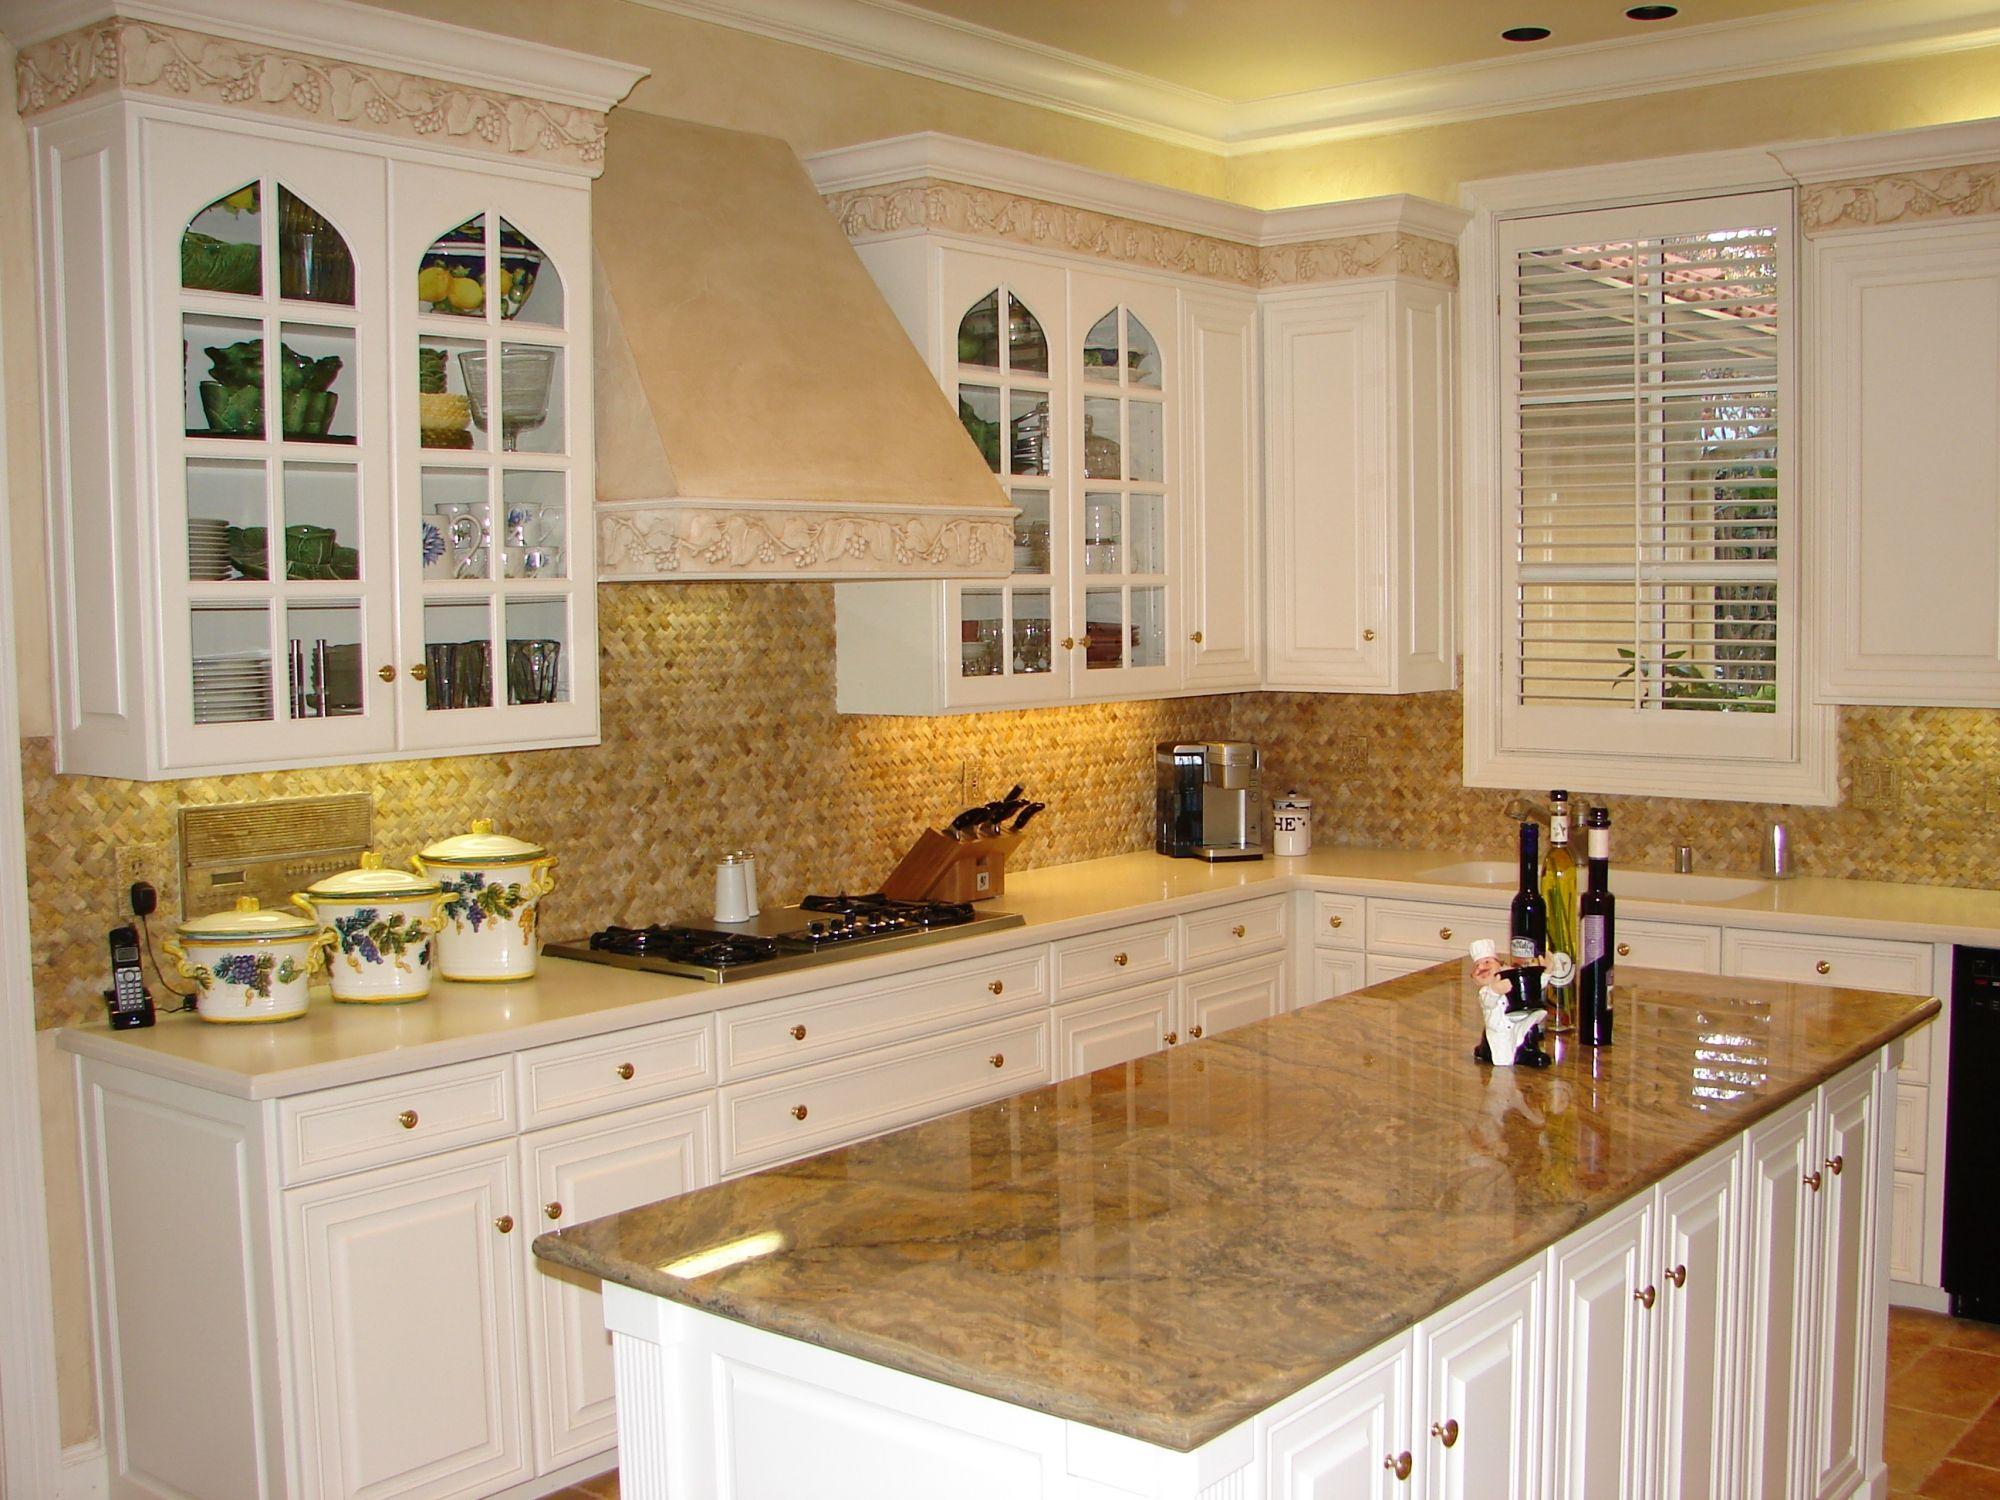 Backsplashes For White Cabinet Kitchens Pictures